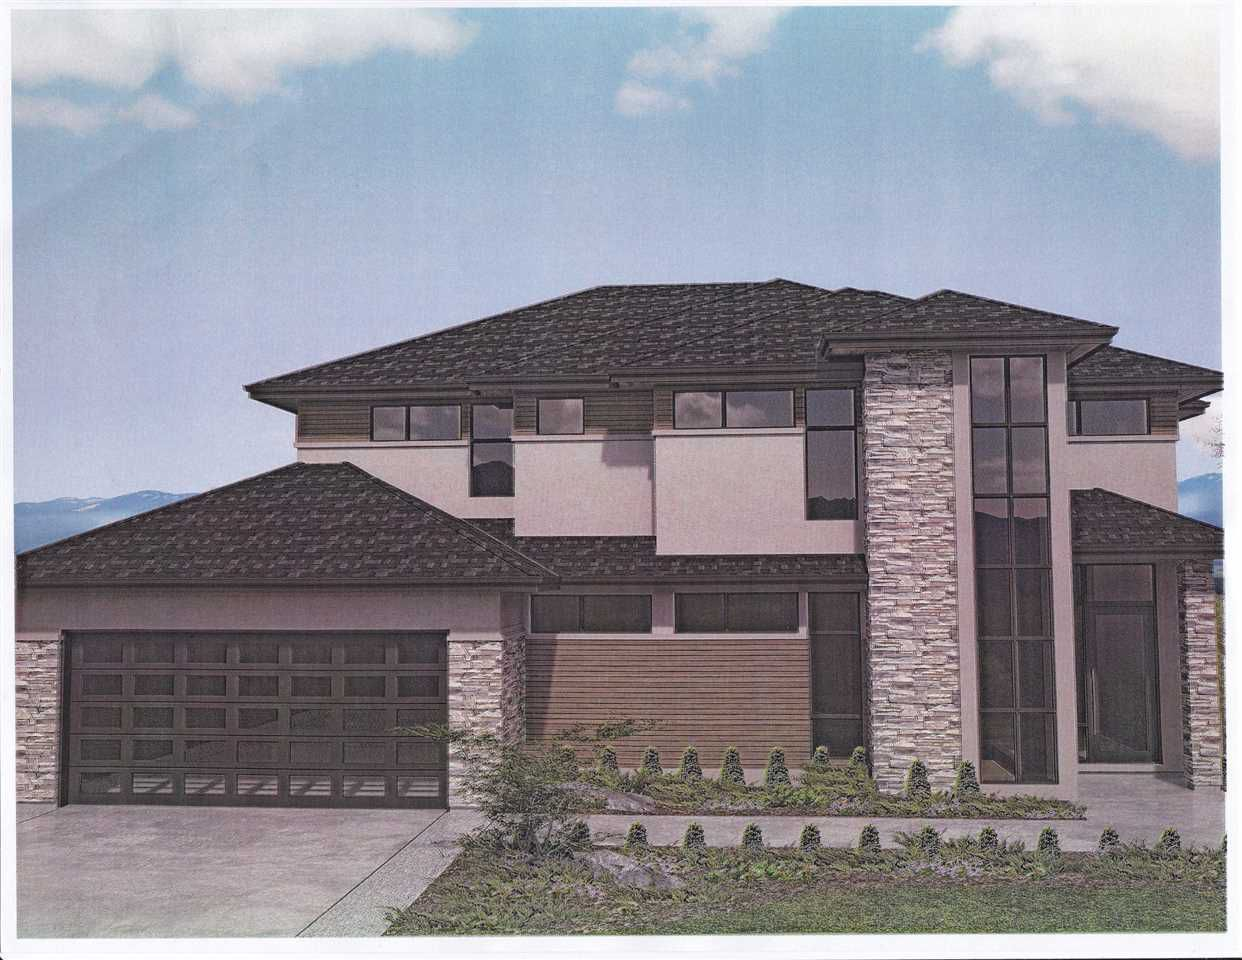 Main Photo: 13699 MCKERCHER Drive in Maple Ridge: Silver Valley House for sale : MLS®# R2046867